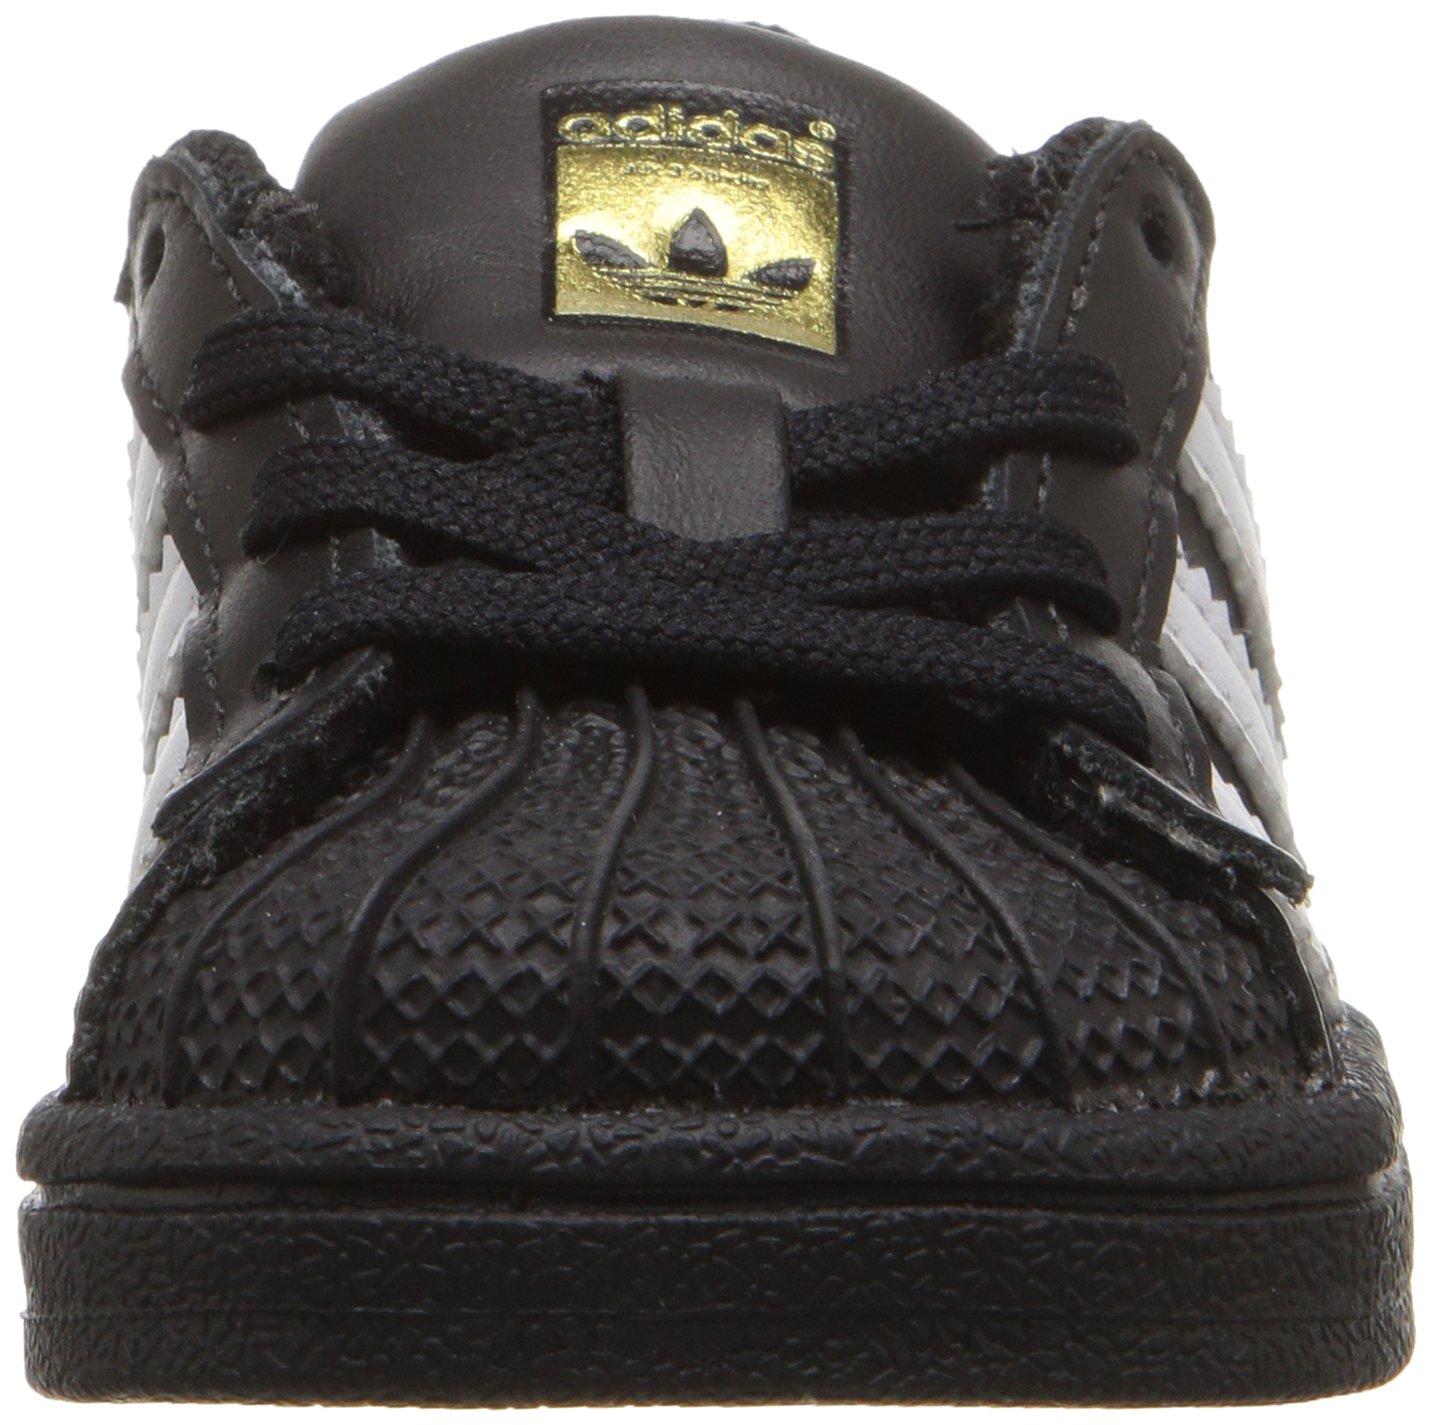 adidas piccola superstar nero / bianco, che, b07bxdmrhv bianco / core 19975